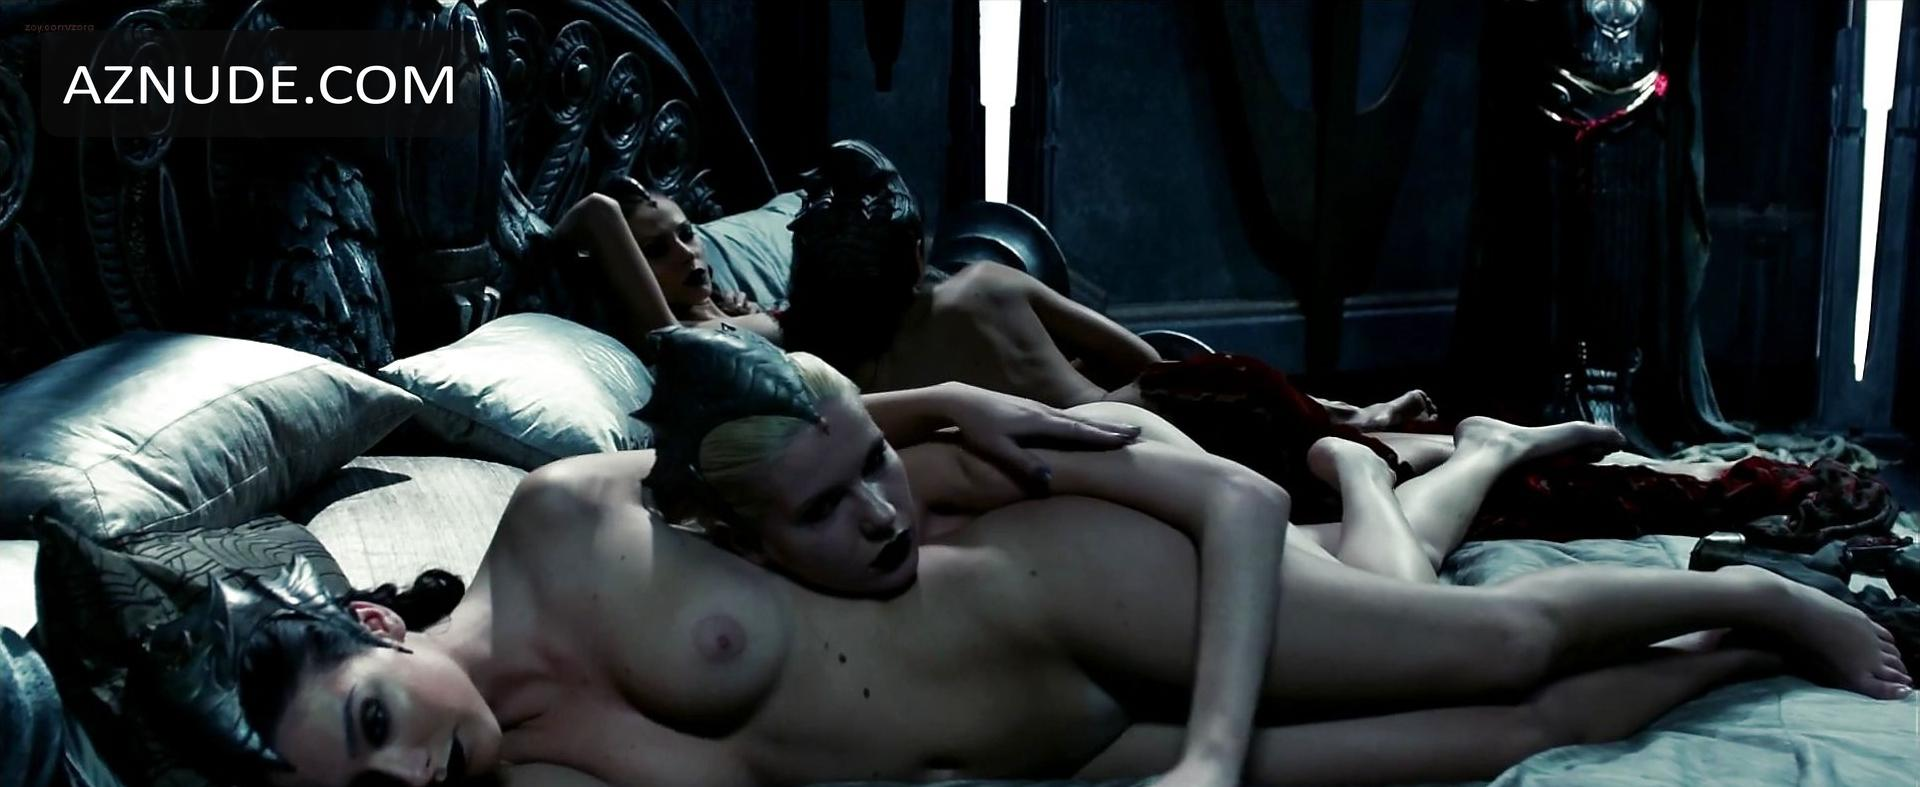 riddick movie nude scene